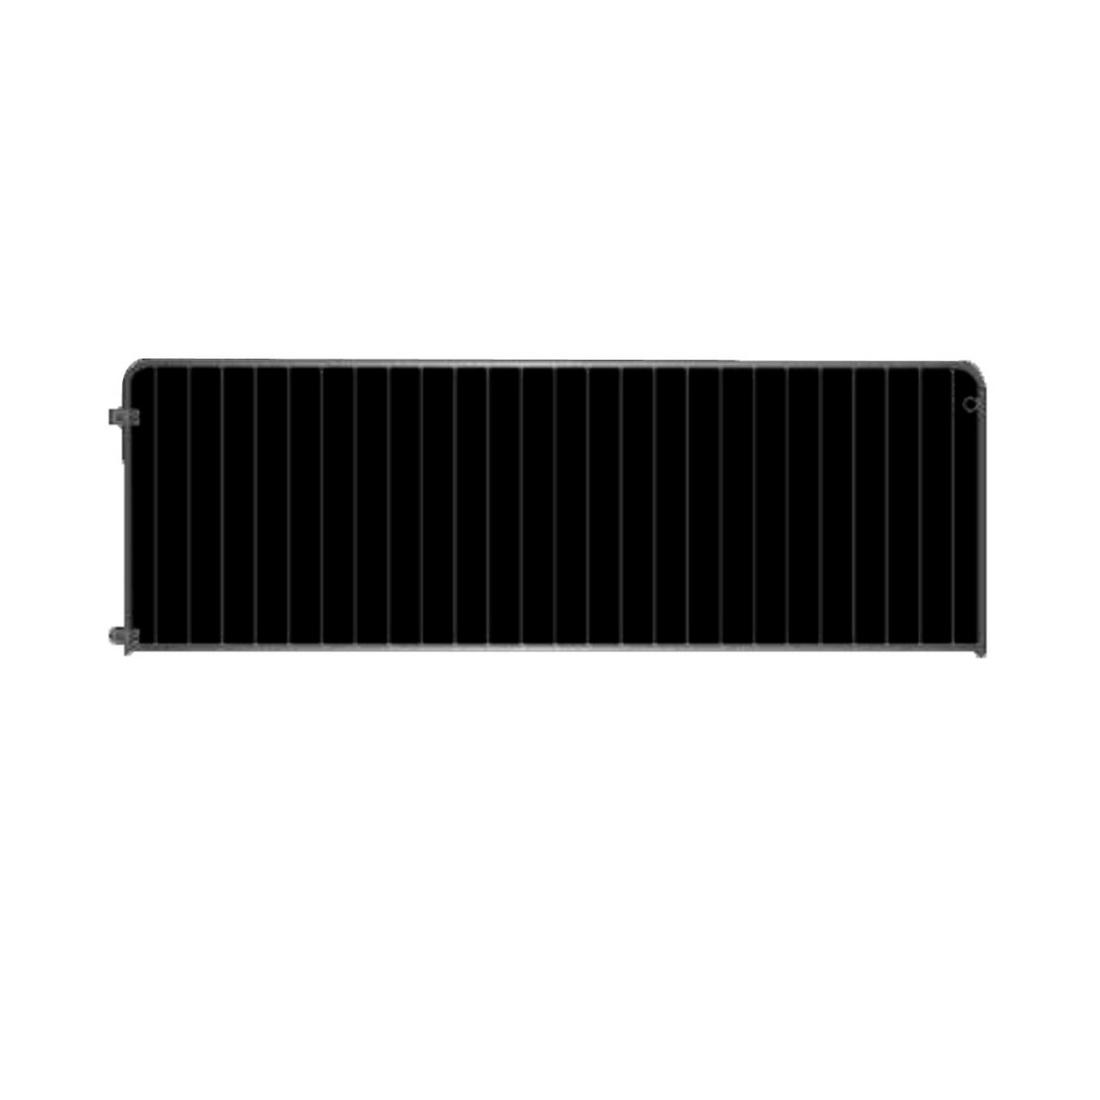 Tru-Test Vertical Barred Gate 3.05 x 1m Hot Dip Galvanised Steel 800143